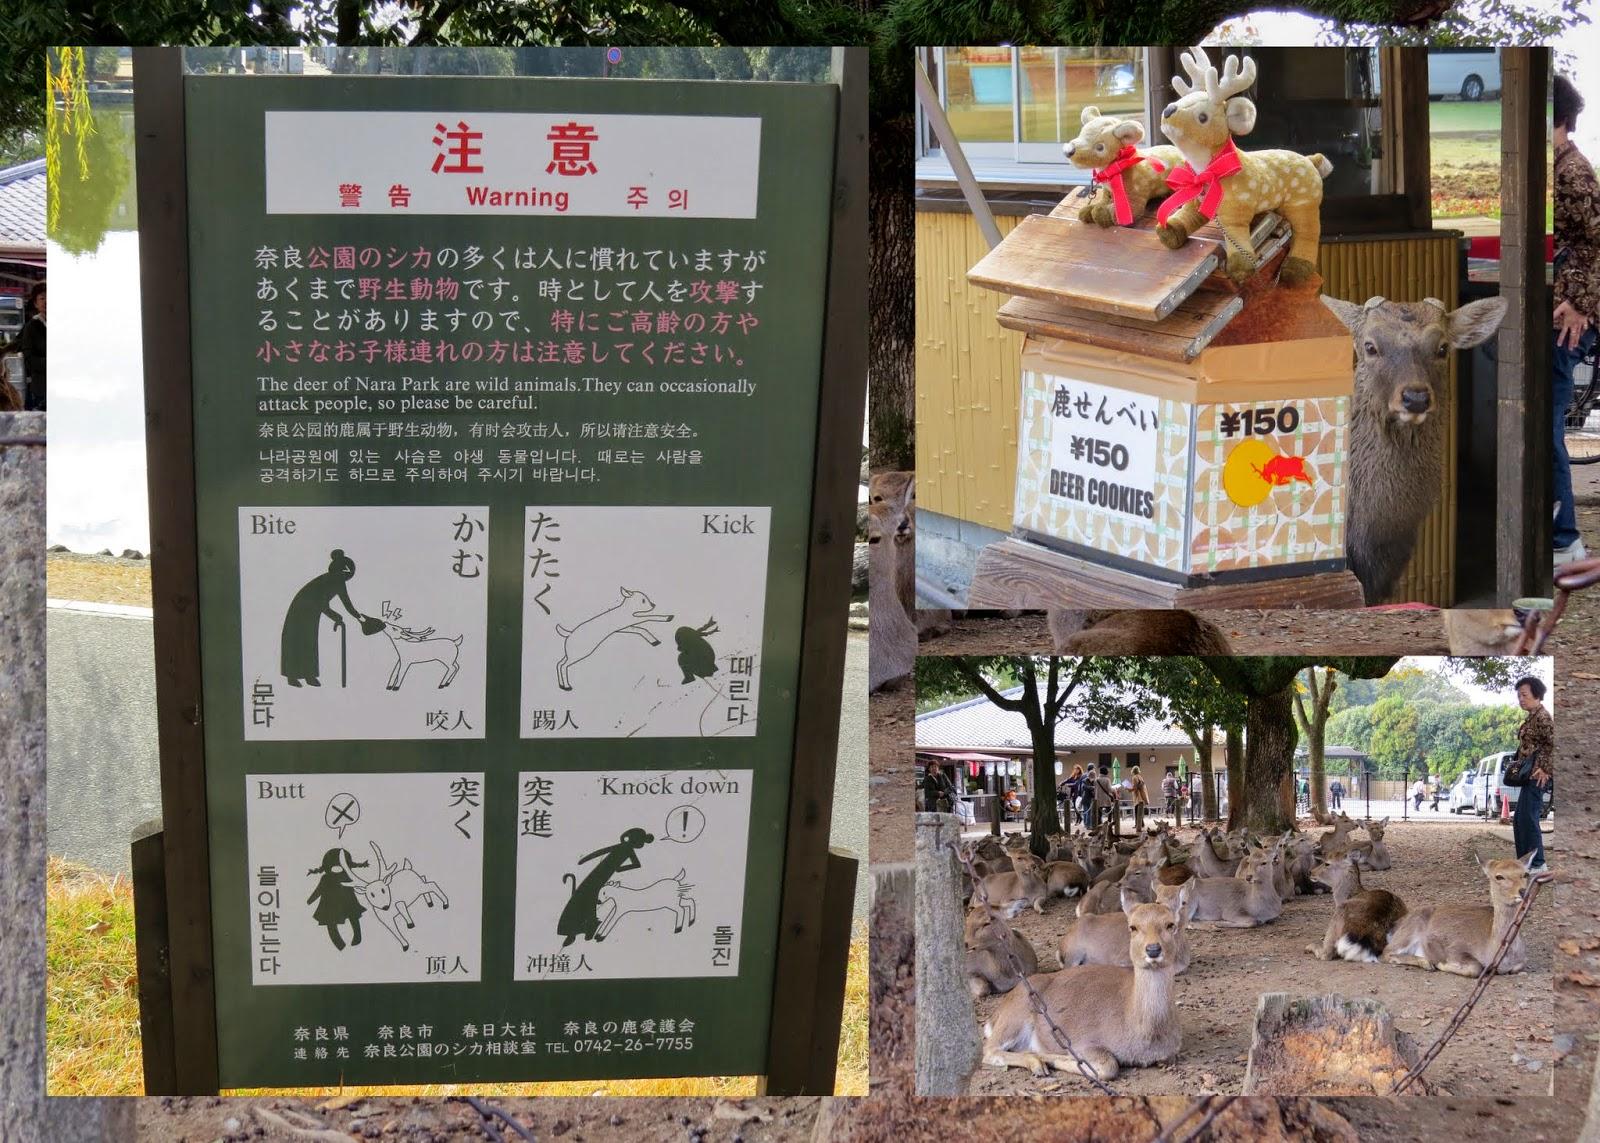 The Deer at Nara, Japan